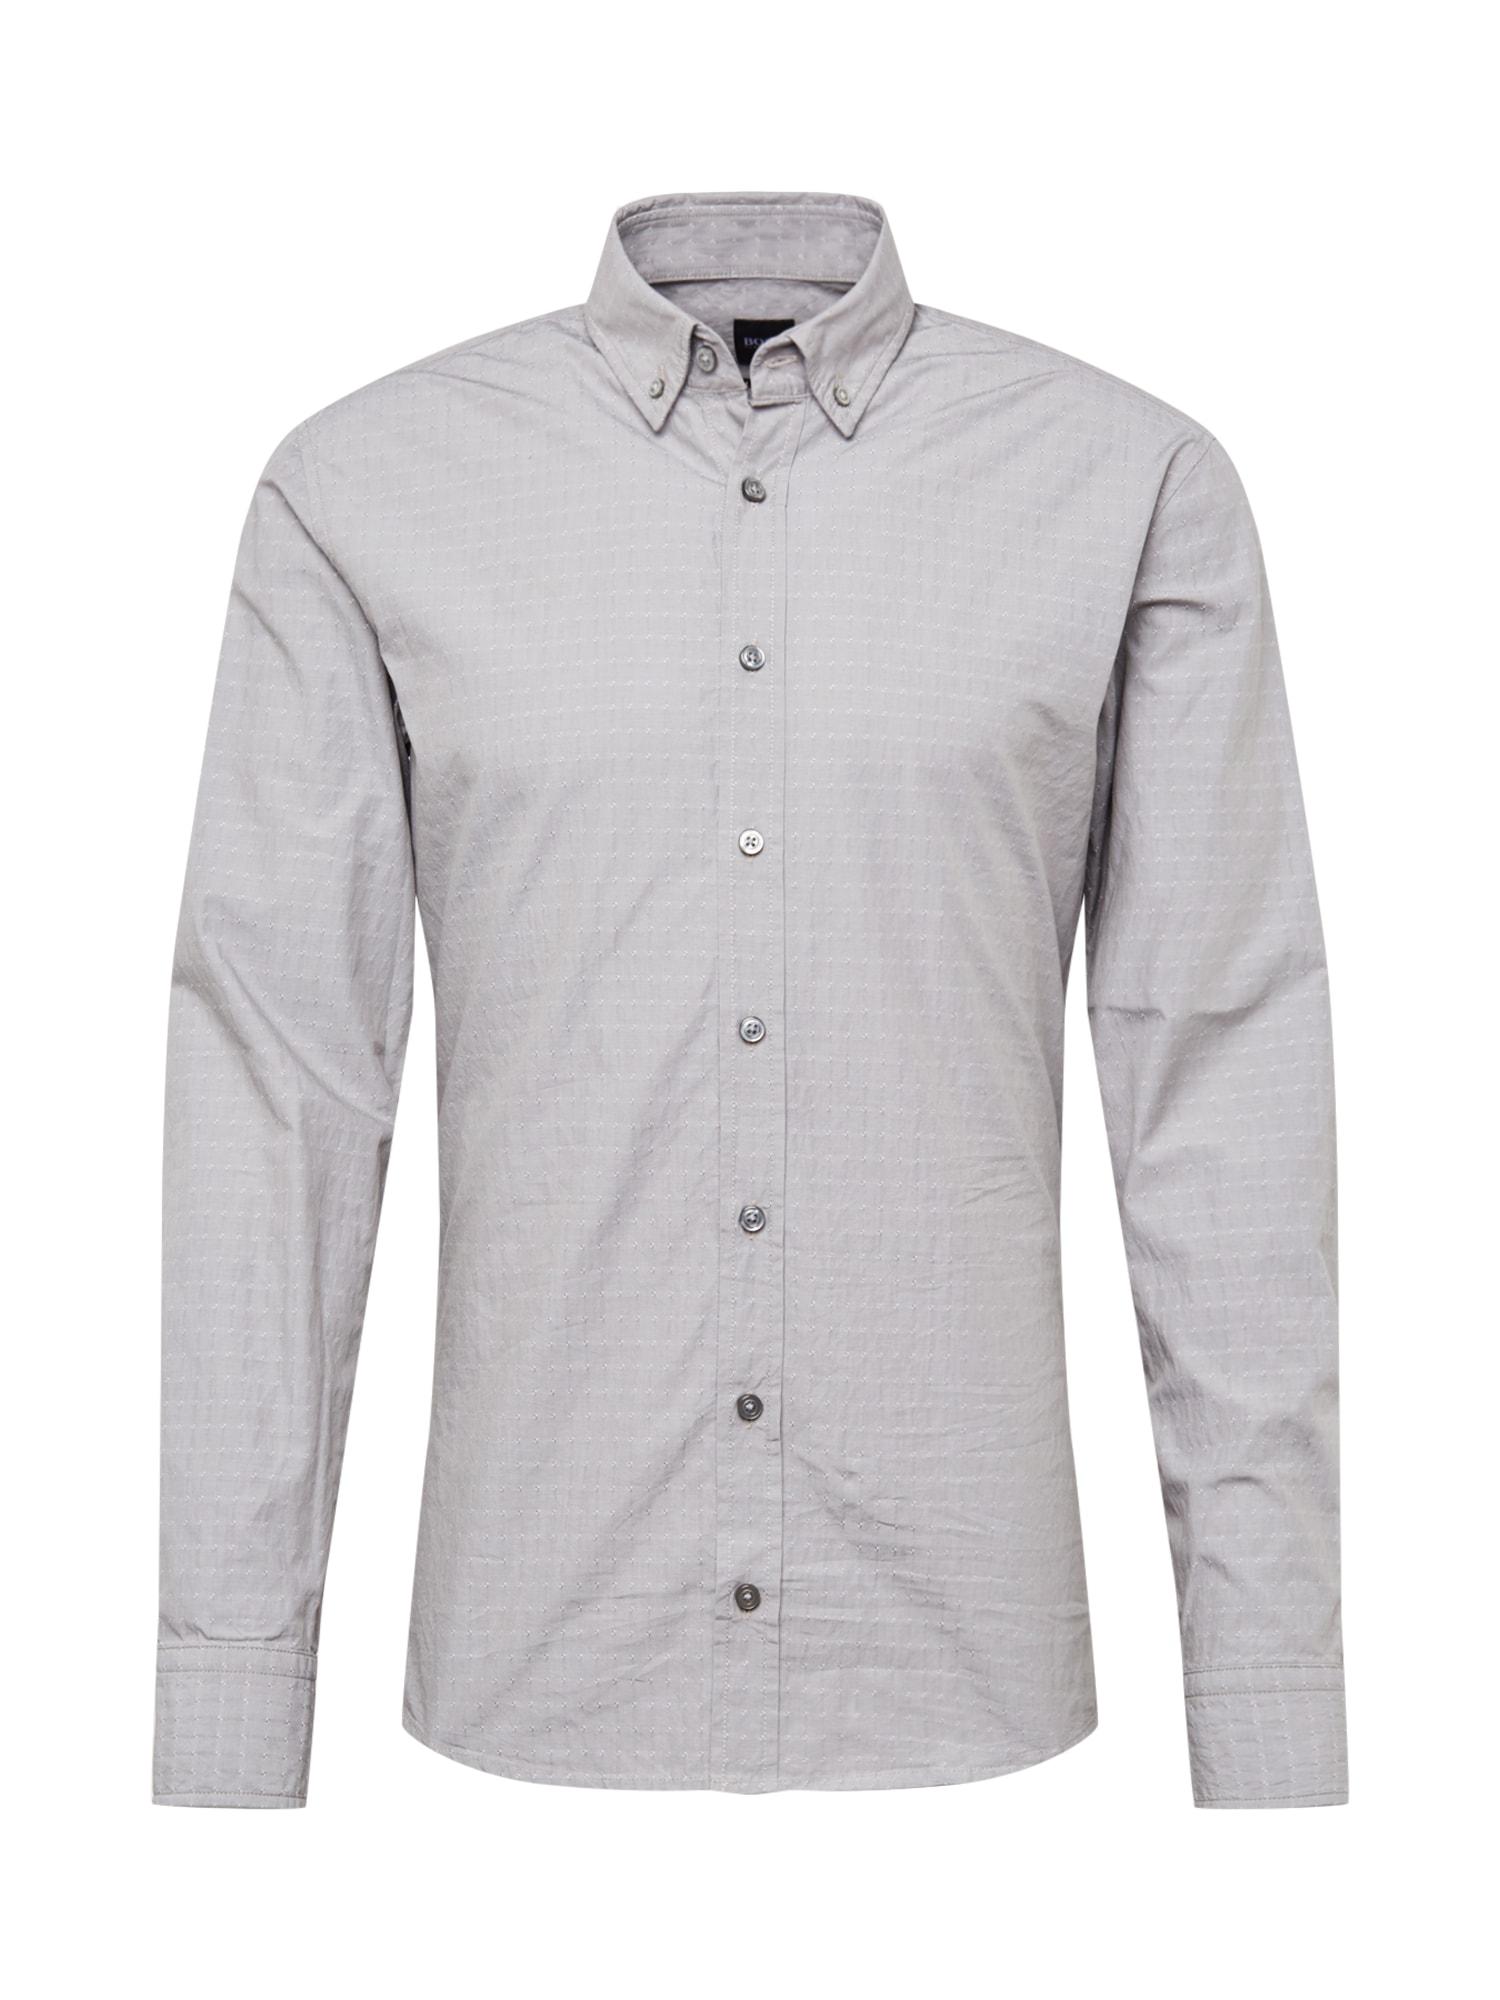 Košile Mabsoot šedá BOSS